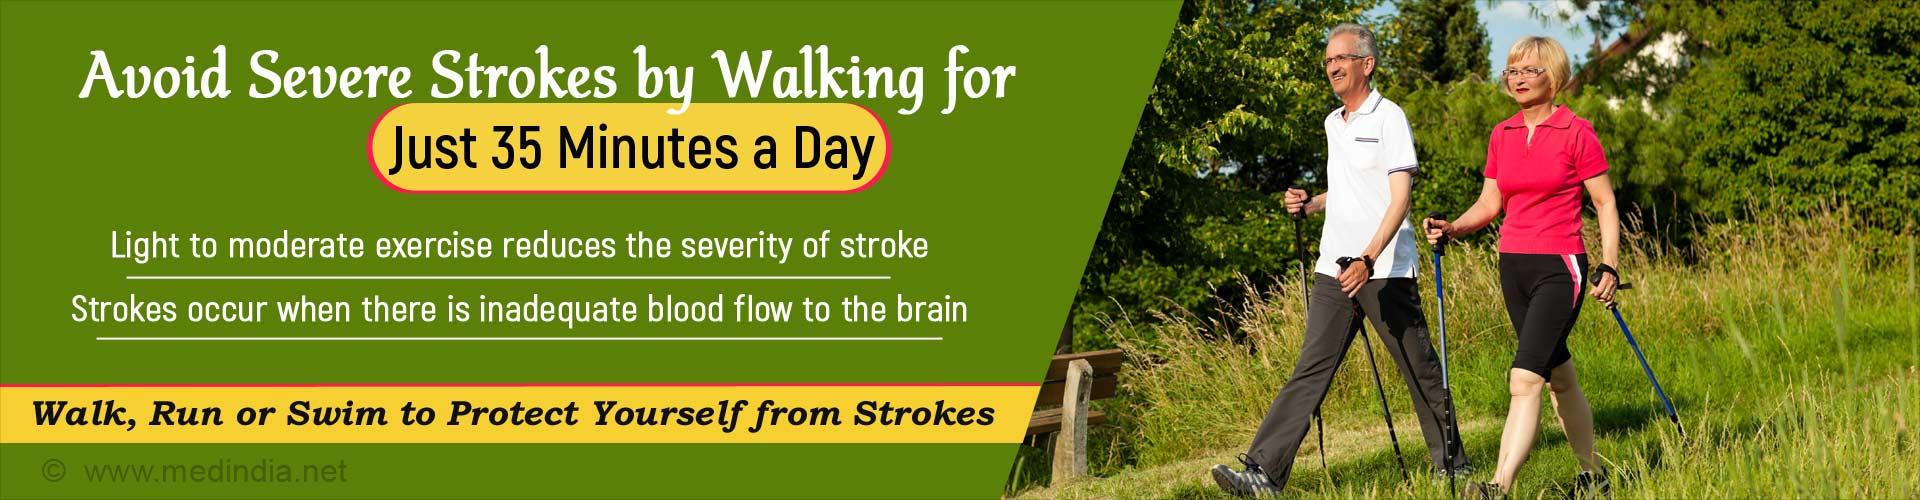 Exercising Moderately Decreases Severity of Stroke